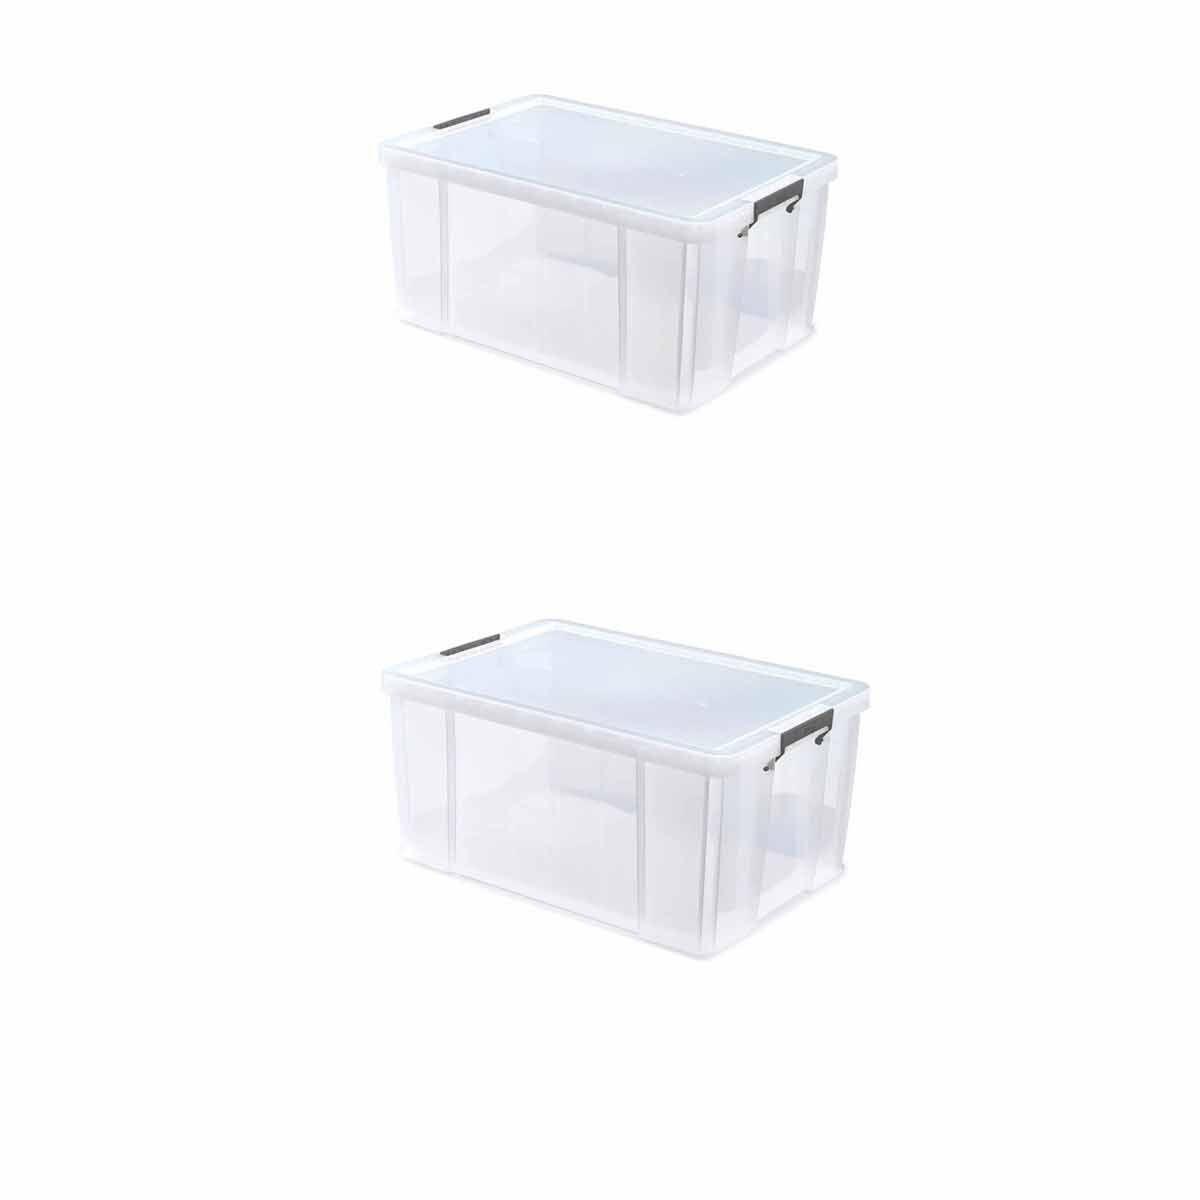 Whitefurze Allstore Plastic Storage Box 70 Litre Pack of 2